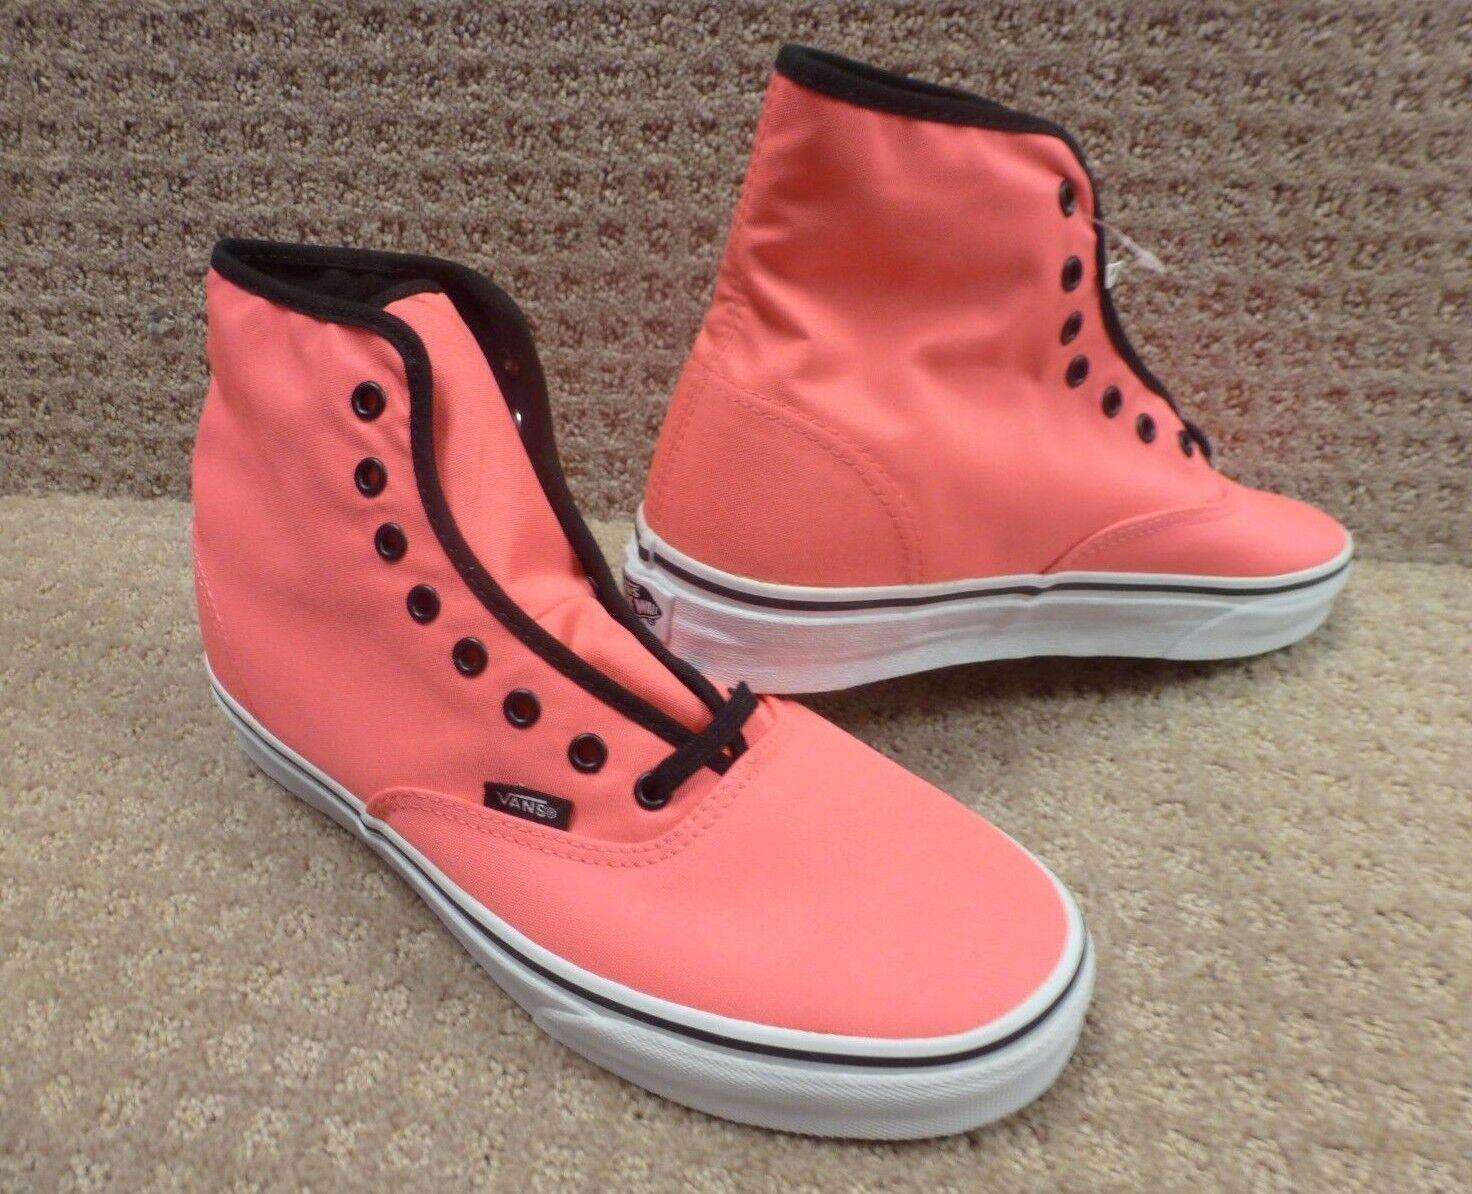 Vans -- Men's Shoes